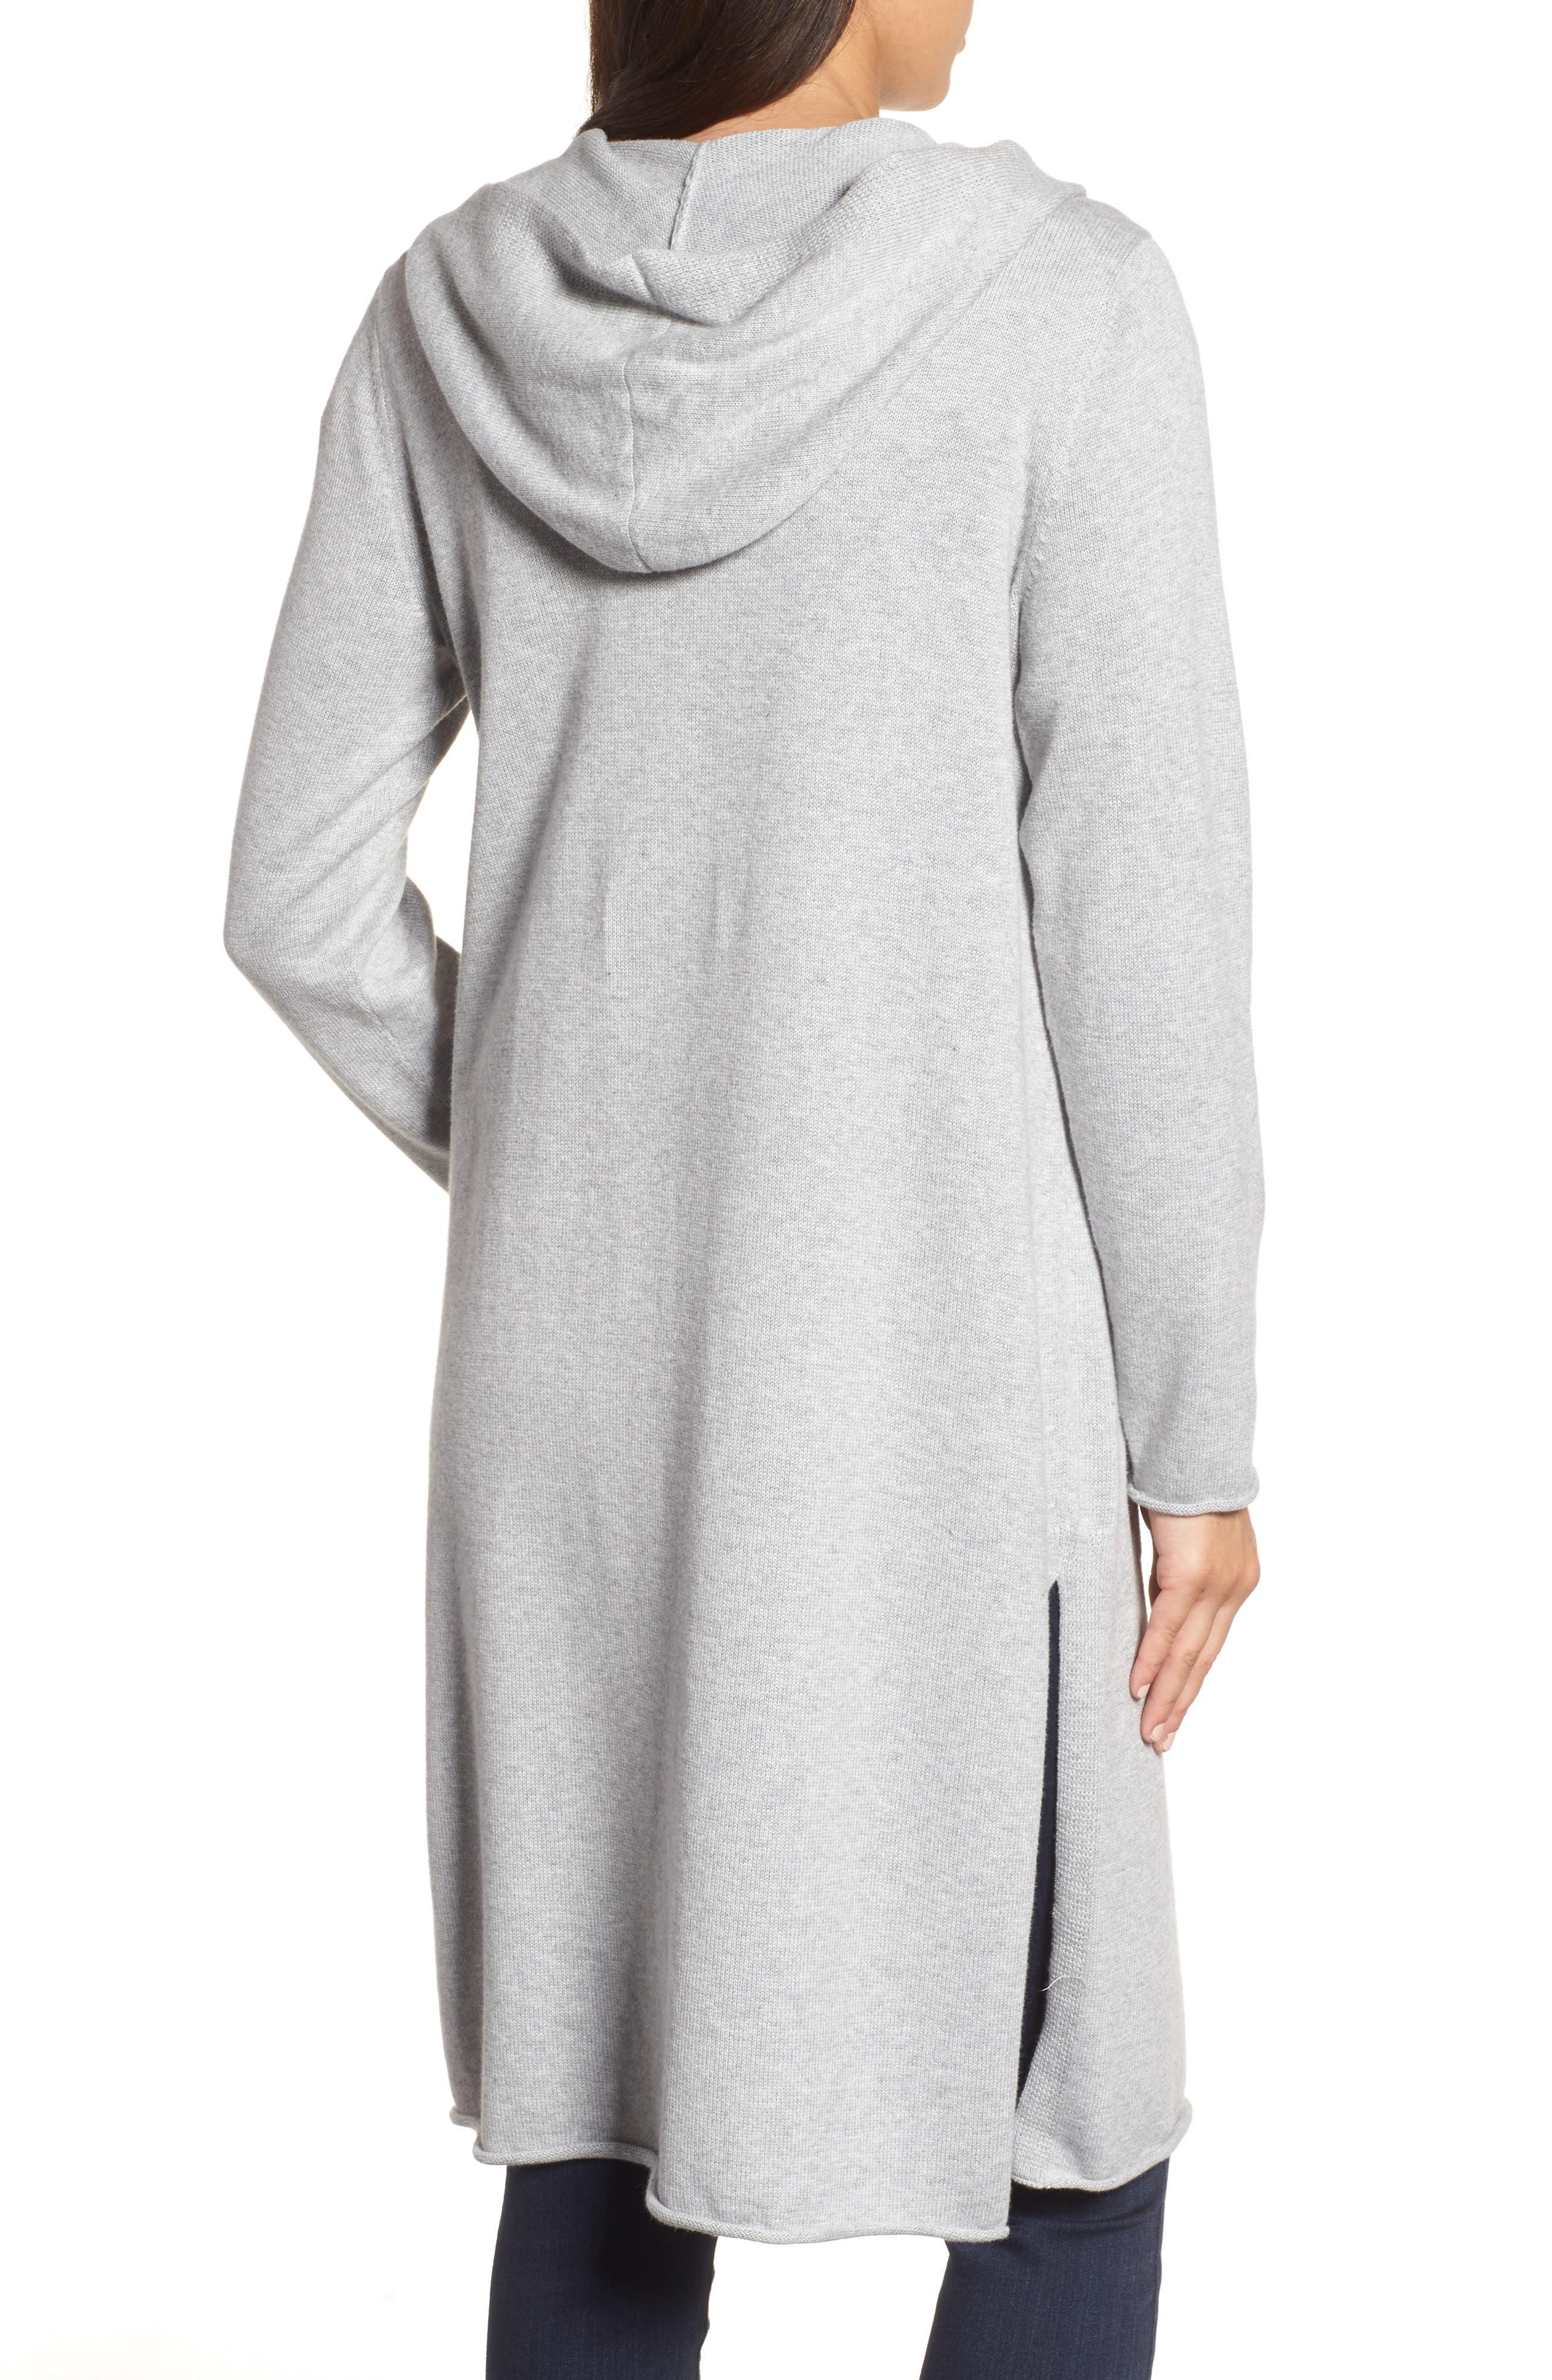 Organic Cotton Hooded Cardigan,                             Alternate thumbnail 2, color,                             022